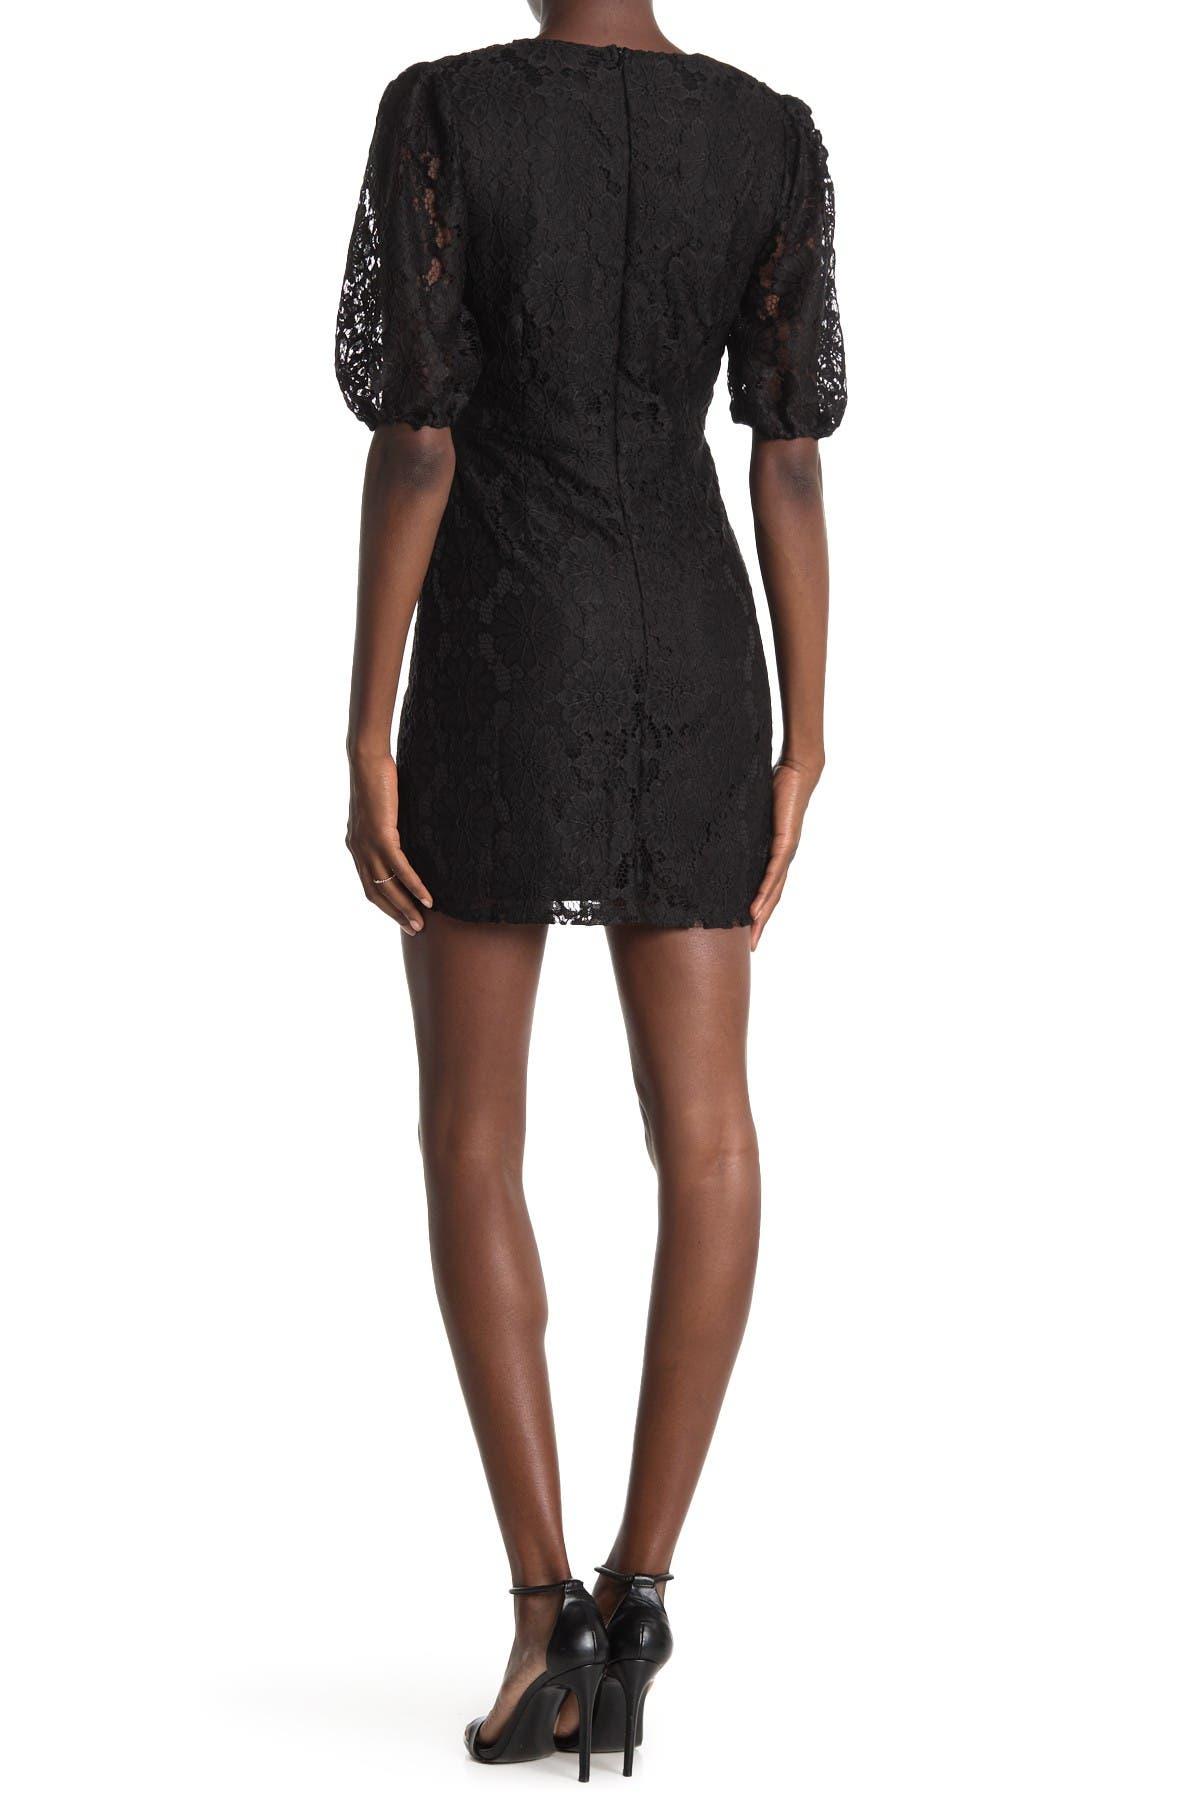 NSR | Harlow Lace Mini Dress | Nordstrom Rack